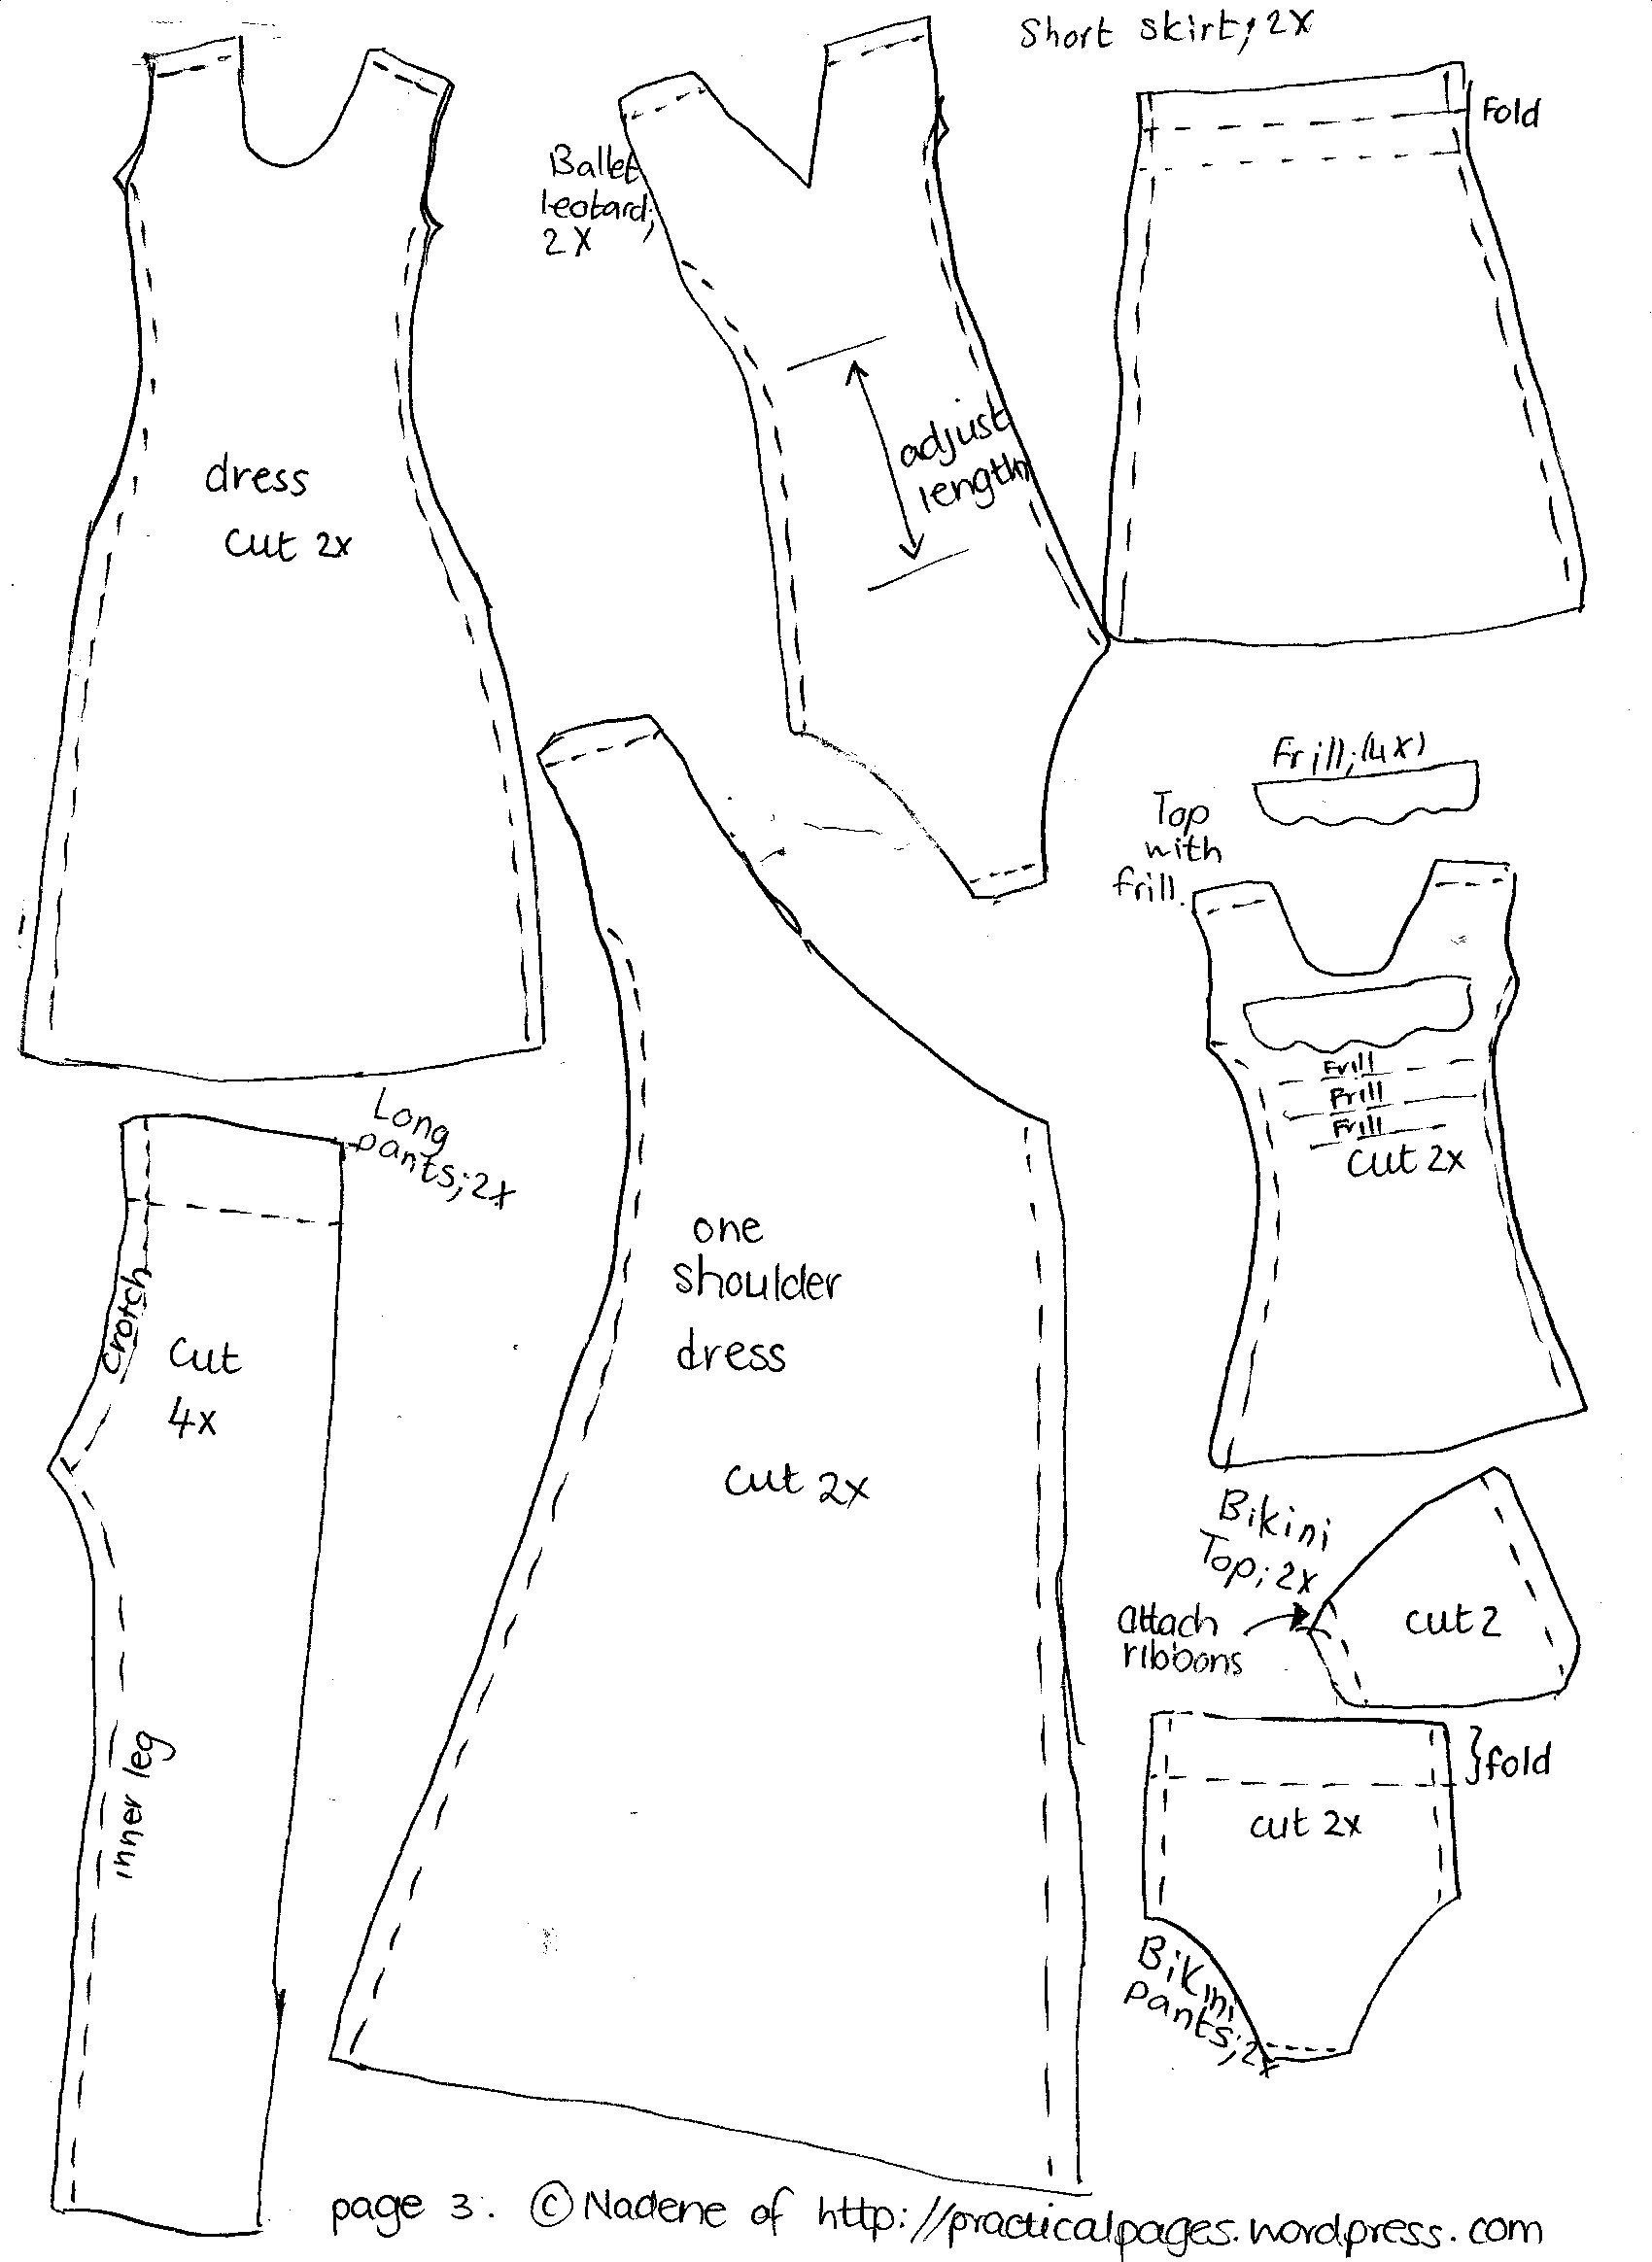 Free Printable American Girl Doll Clothes Patterns Awesome Make A - American Girl Clothes Patterns Free Printable